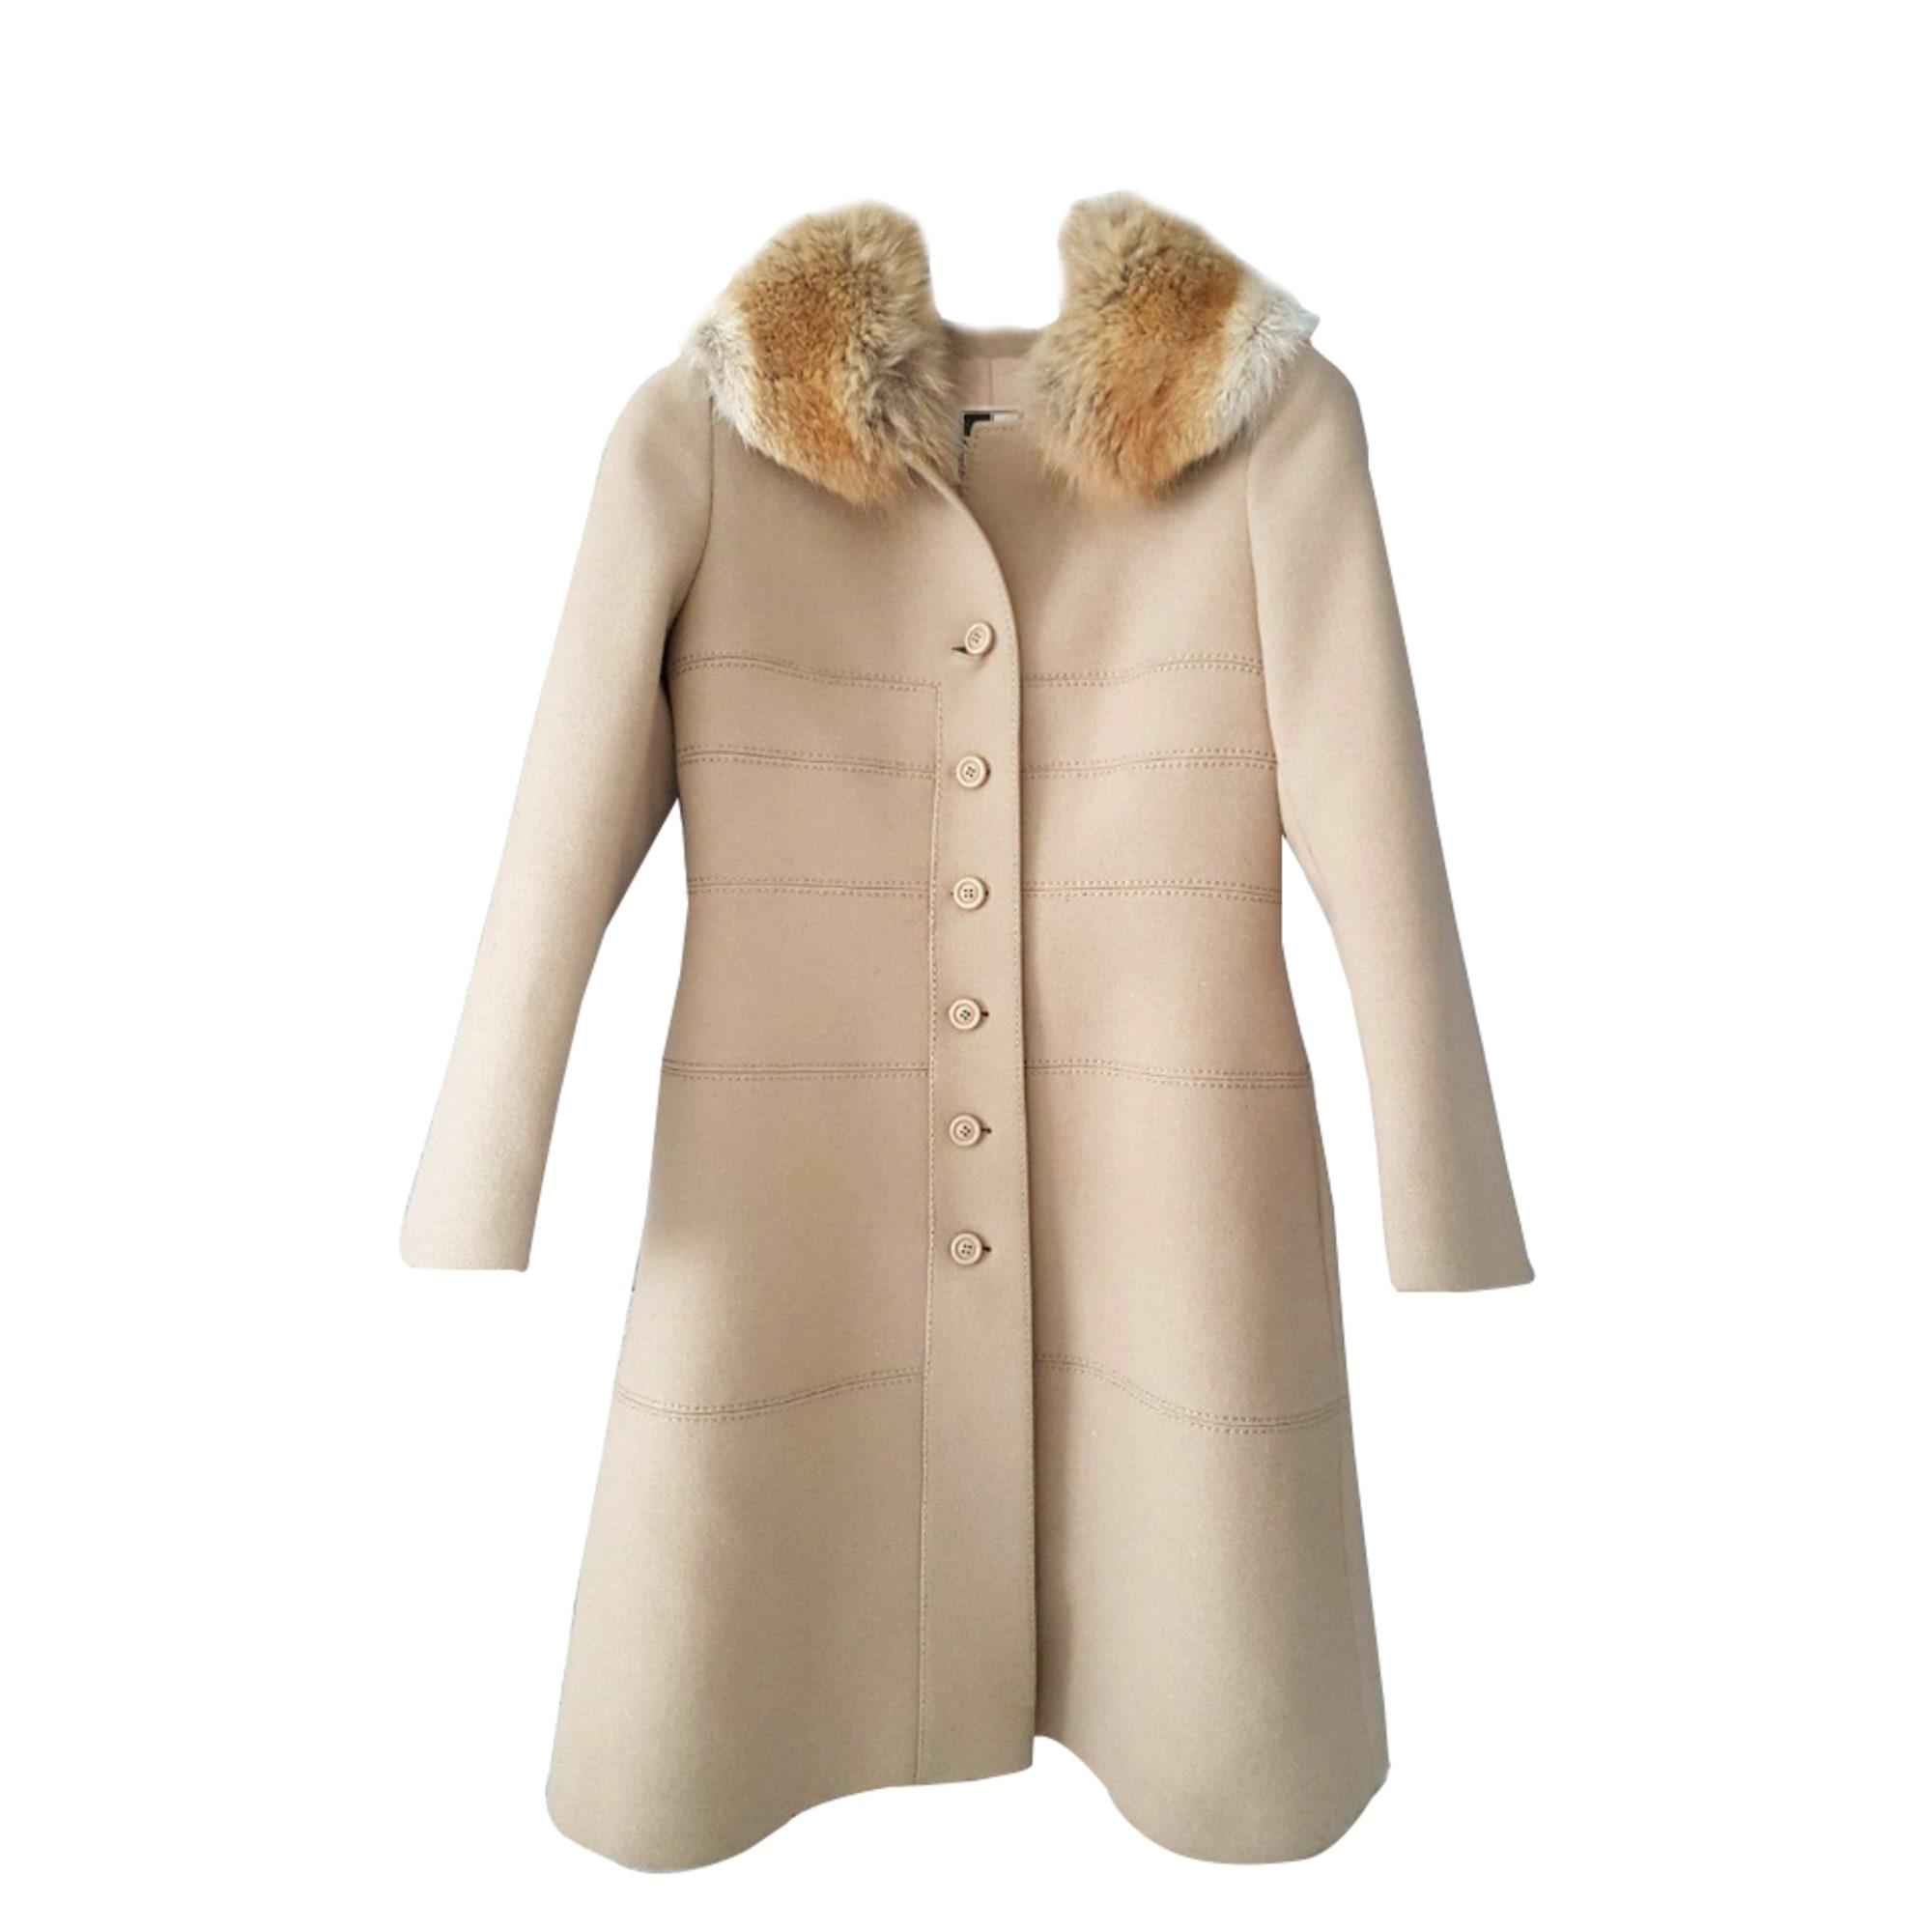 Manteau femme hiver weill